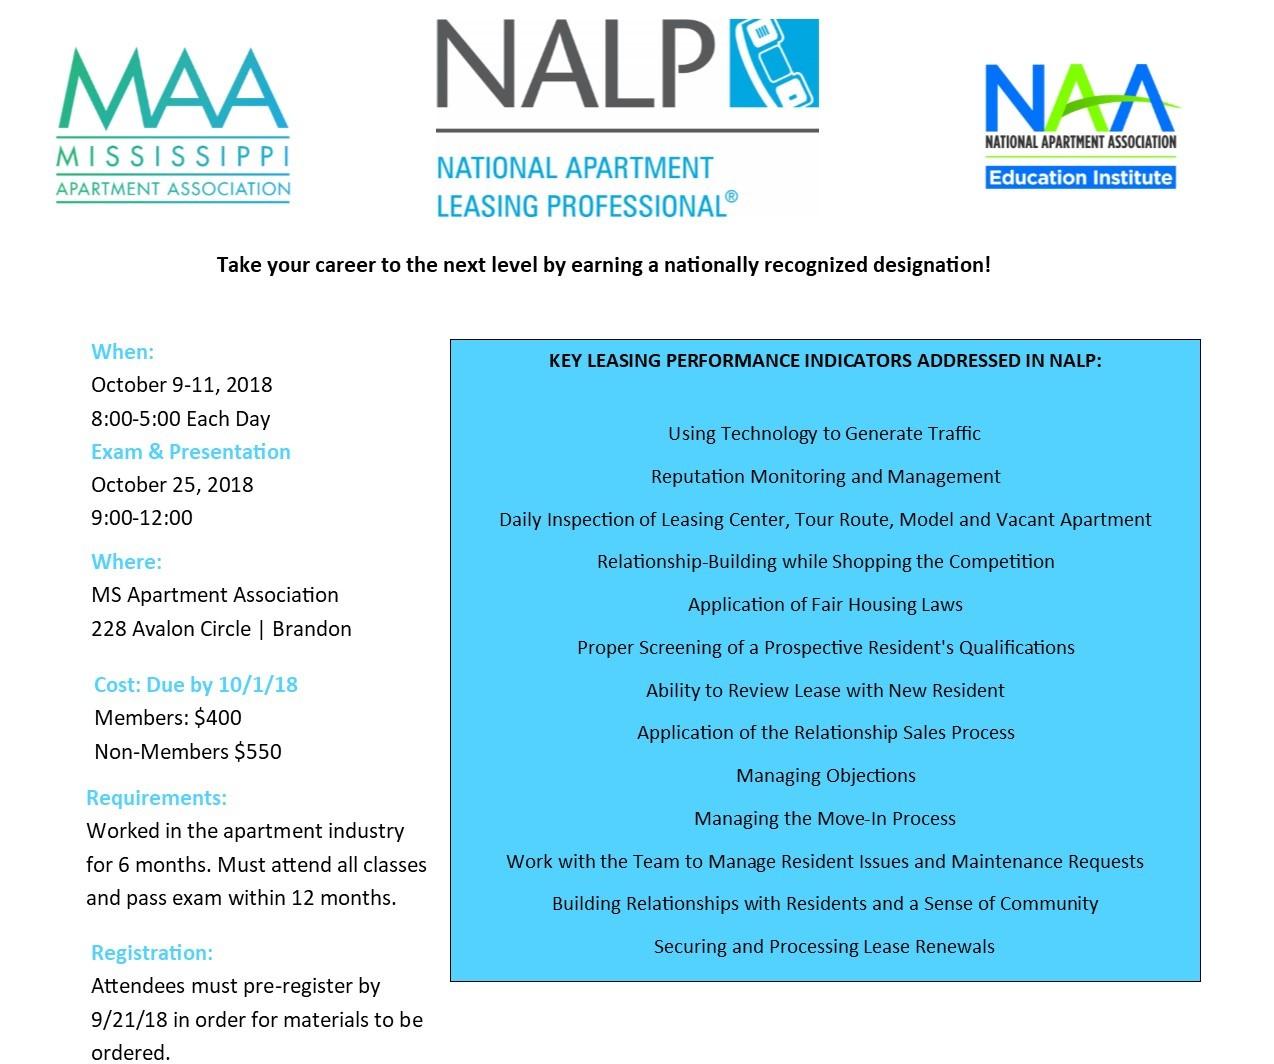 NALP Flyer.jpg